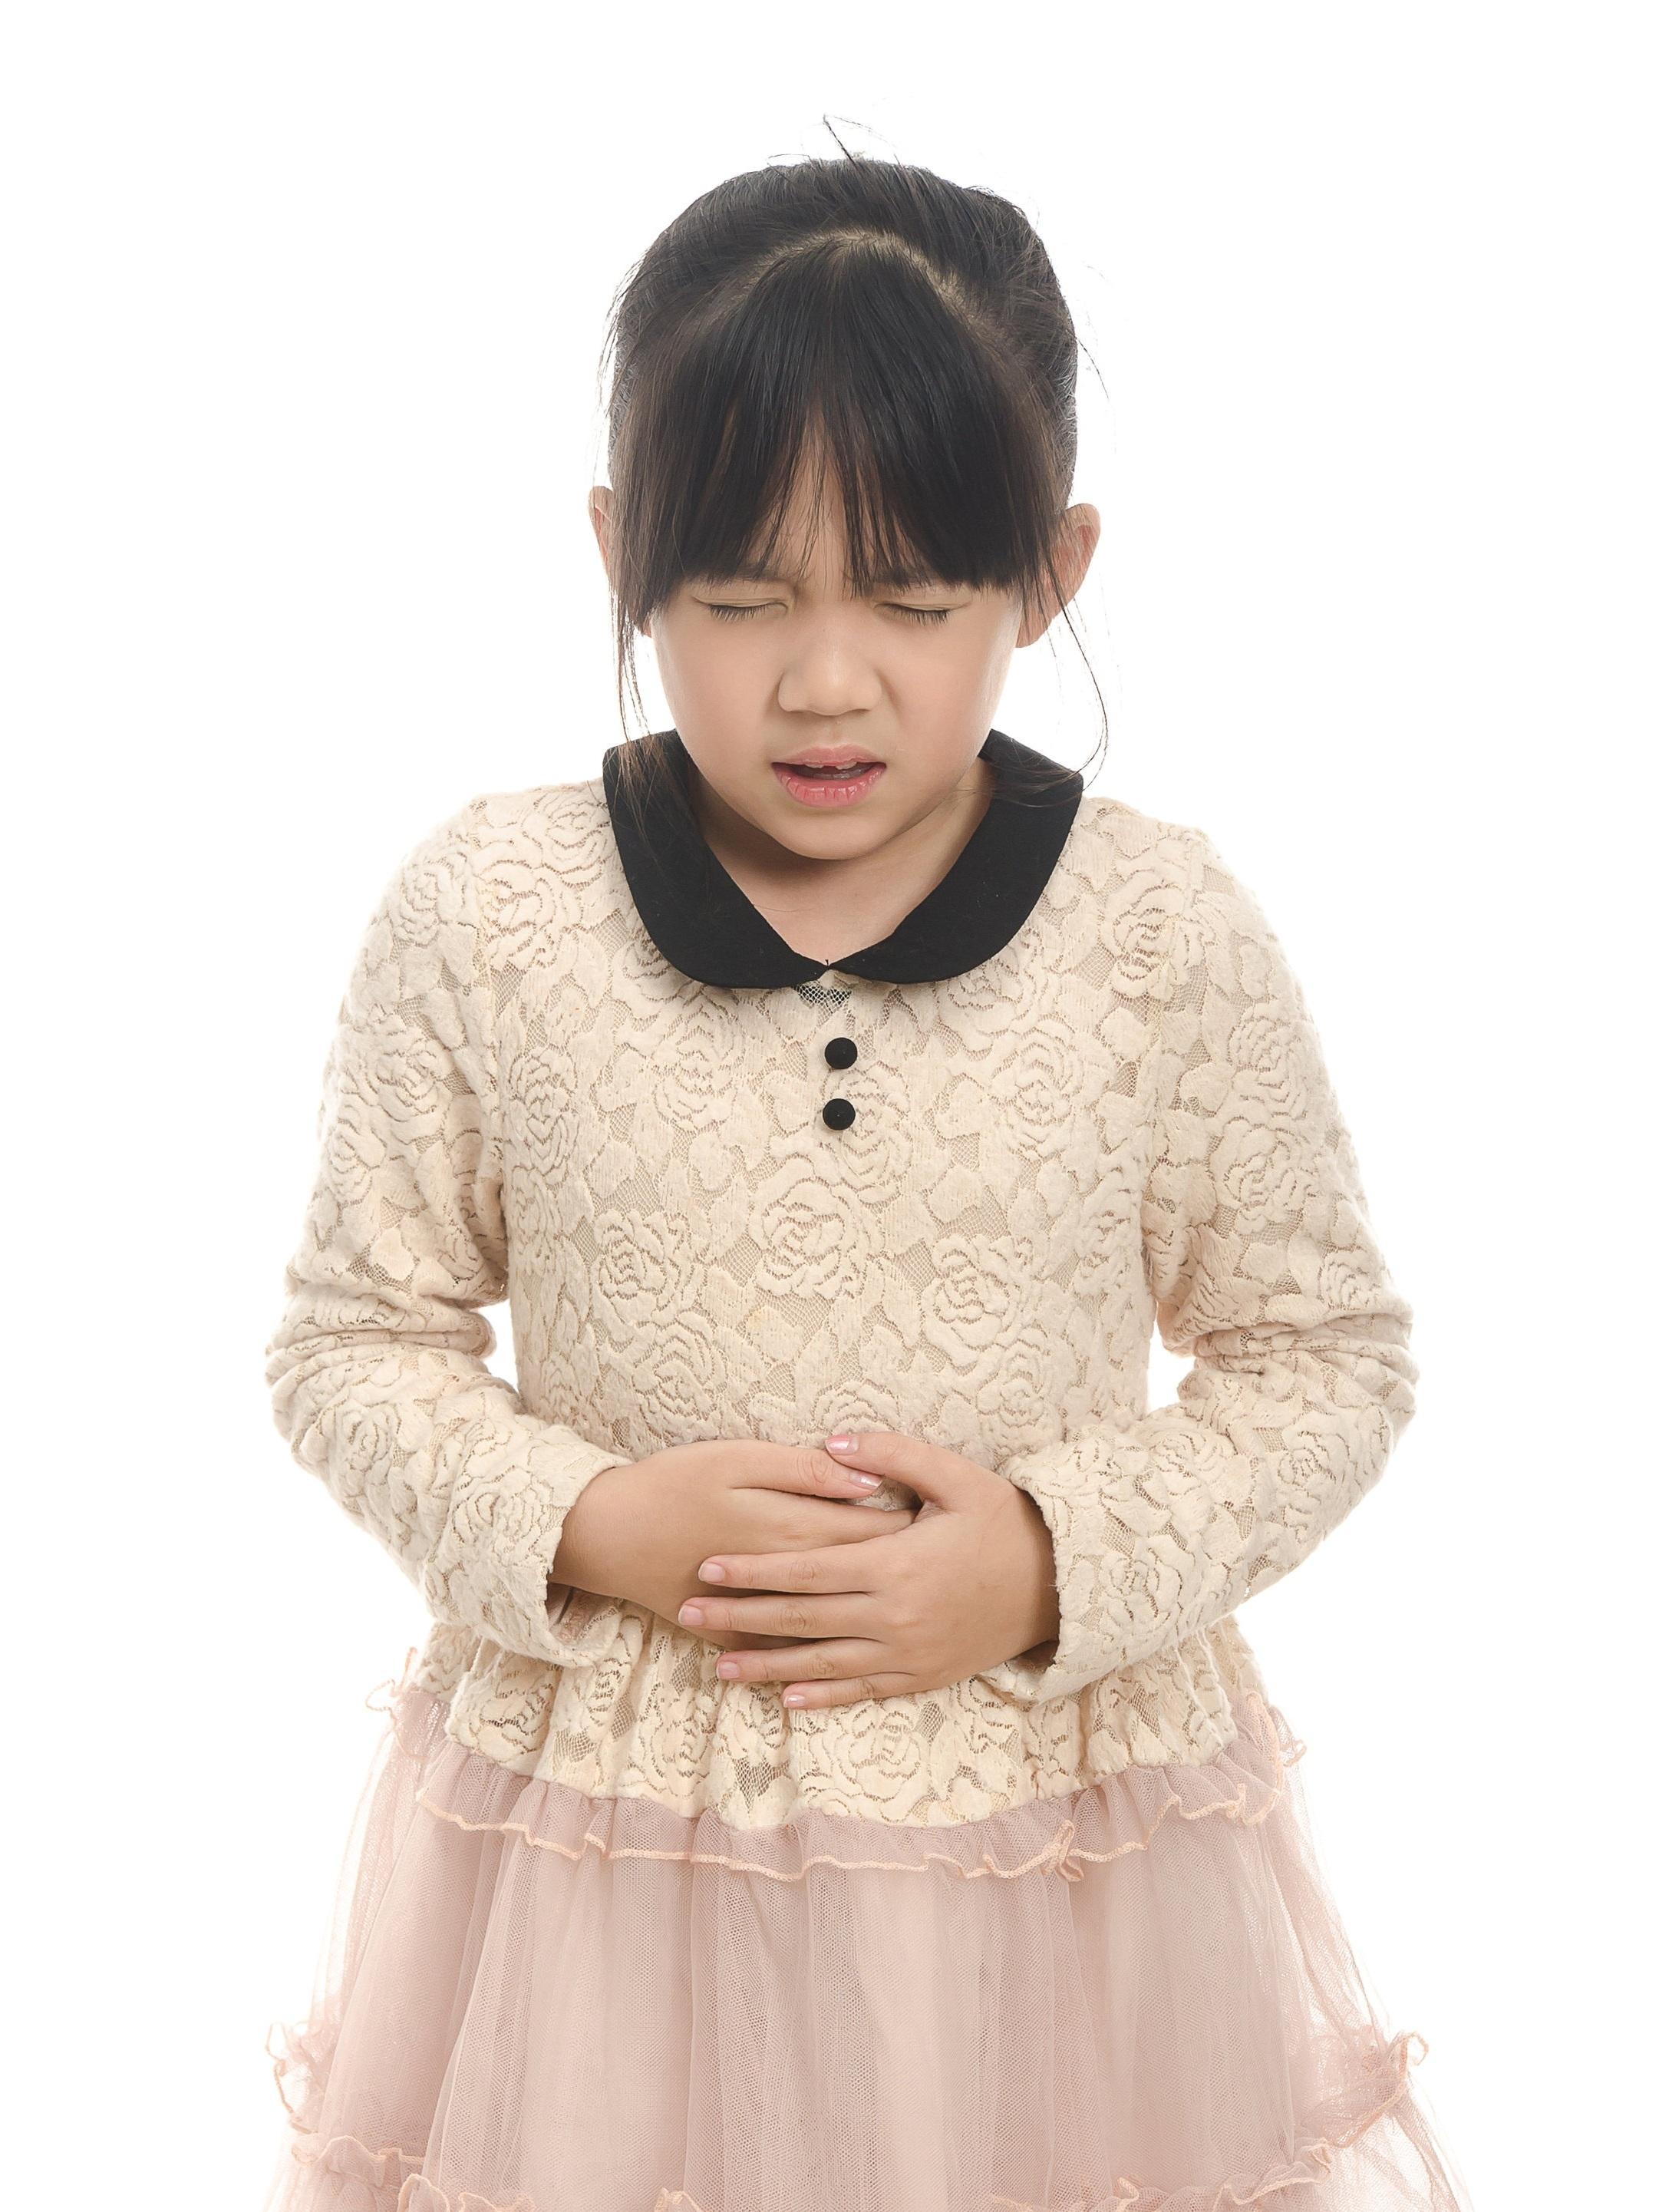 kids stress symptoms.jpg